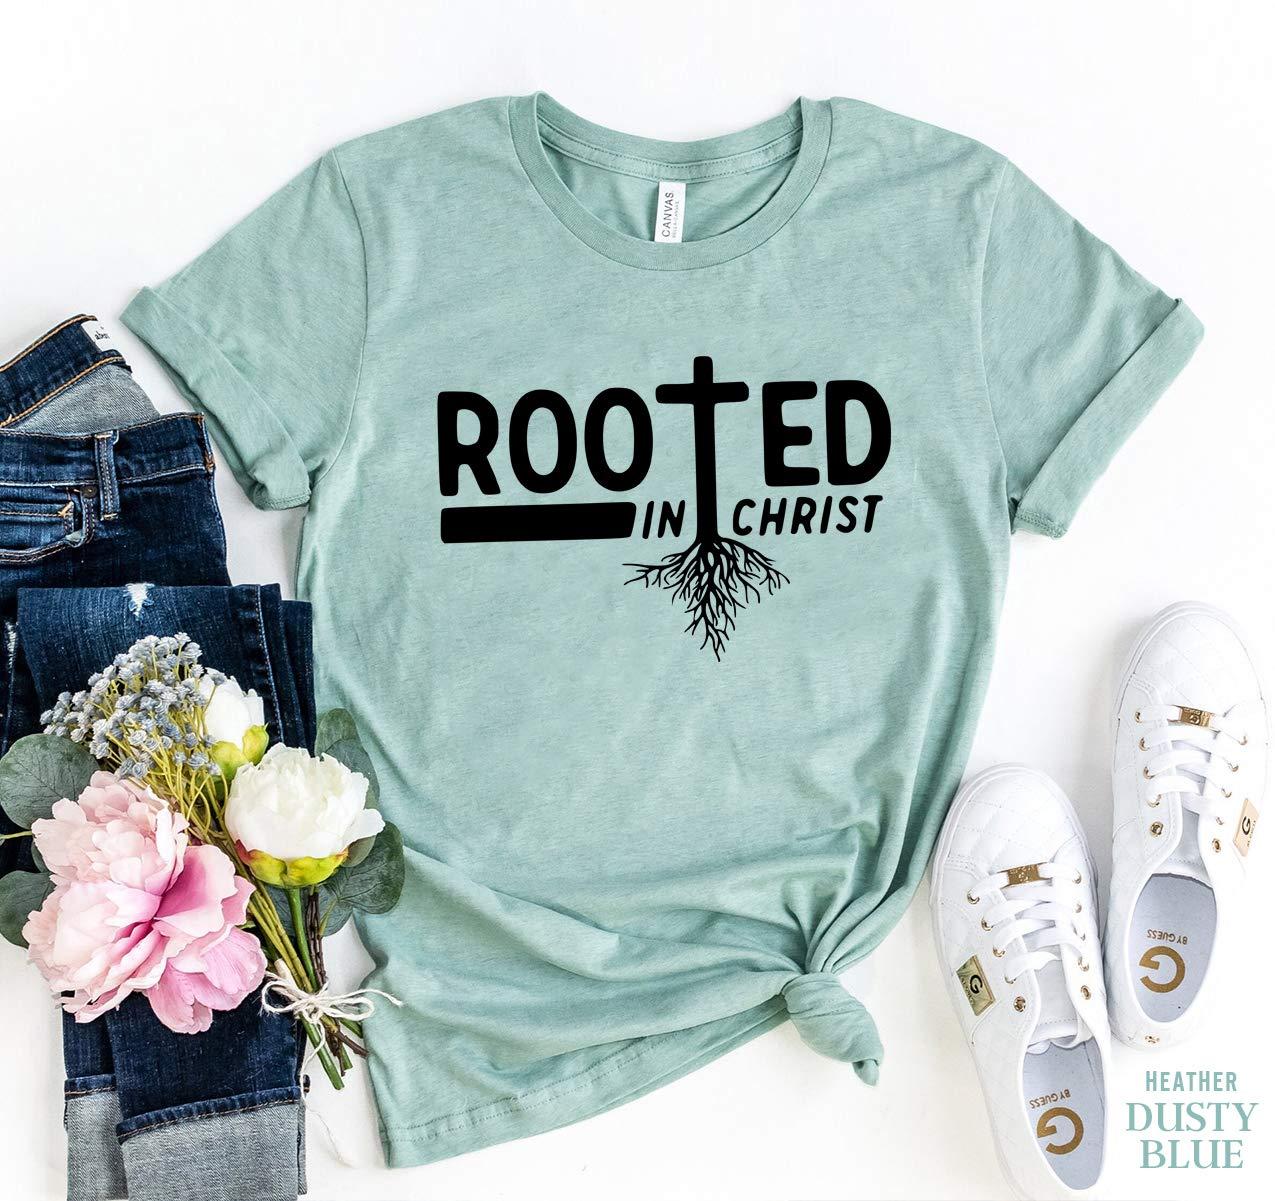 Rooted in Christ T-shirt, Christian Tshirt, Vertical Cross Shirt, Religious T-shirt, Church Tshirt, Jesus Shirt, Christian Gift T-shirt, Gift For Her